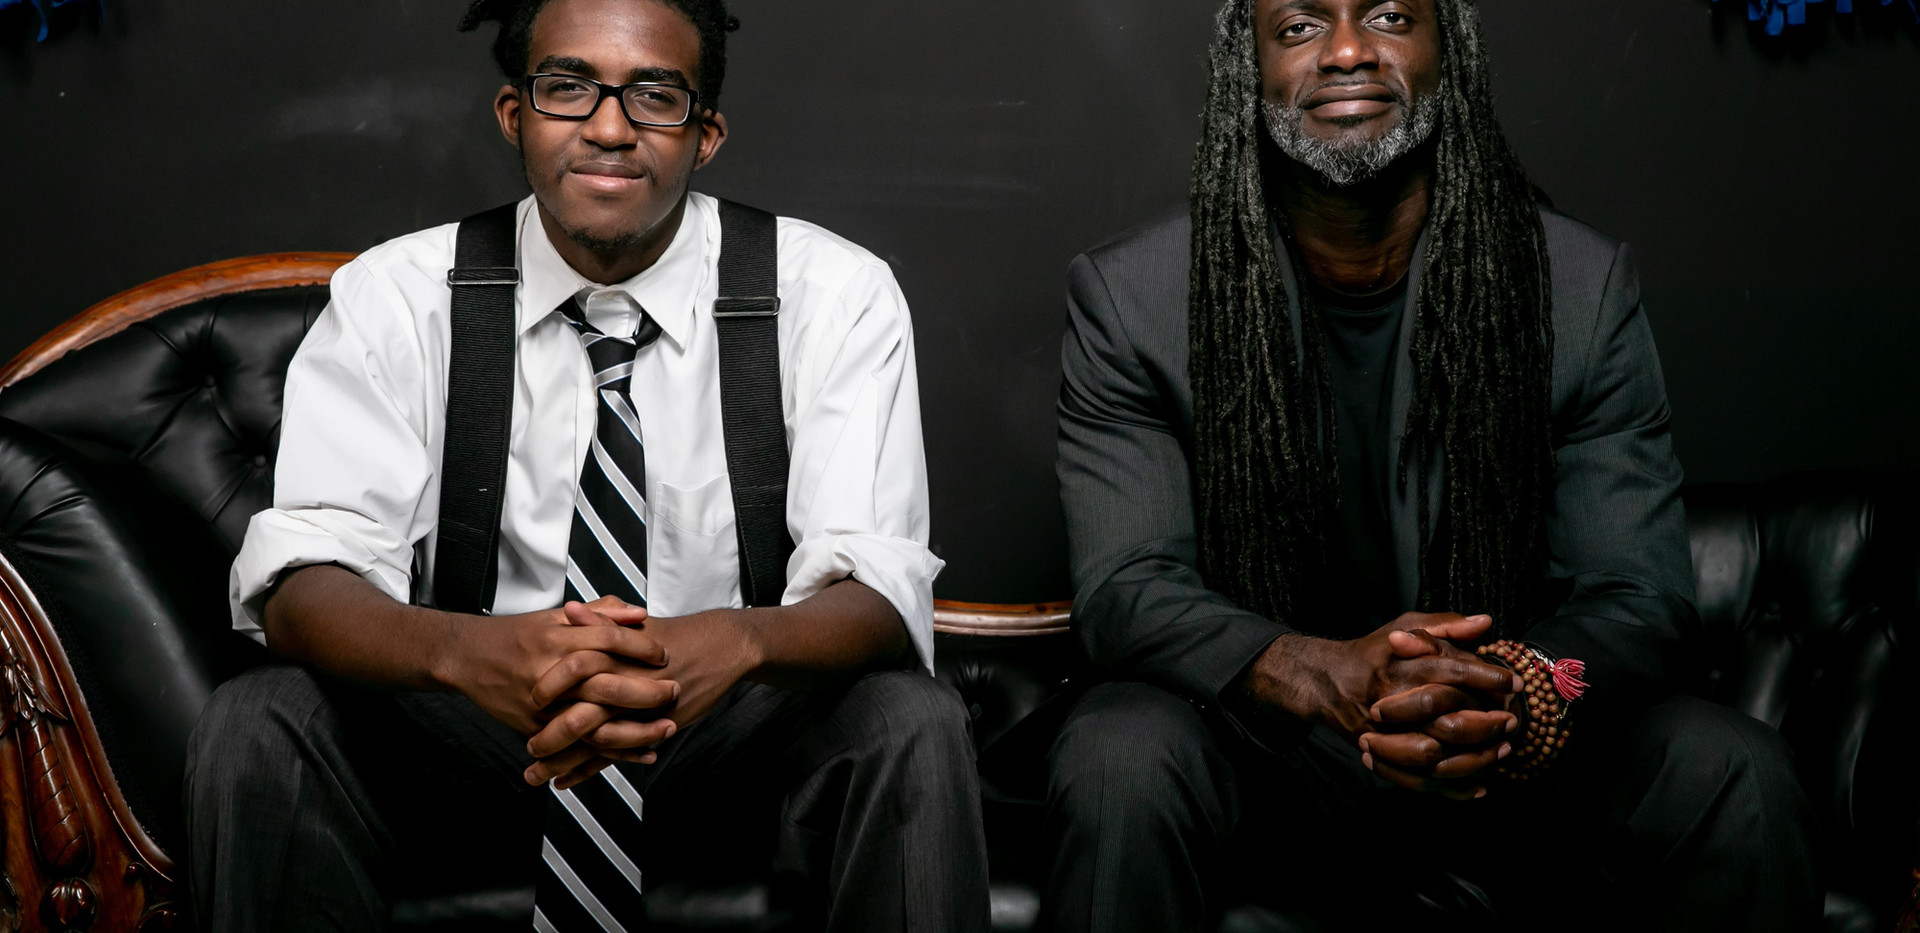 Naphtali Amen-Allah & Patrick Mugalu, photographed by Erika Schultz.